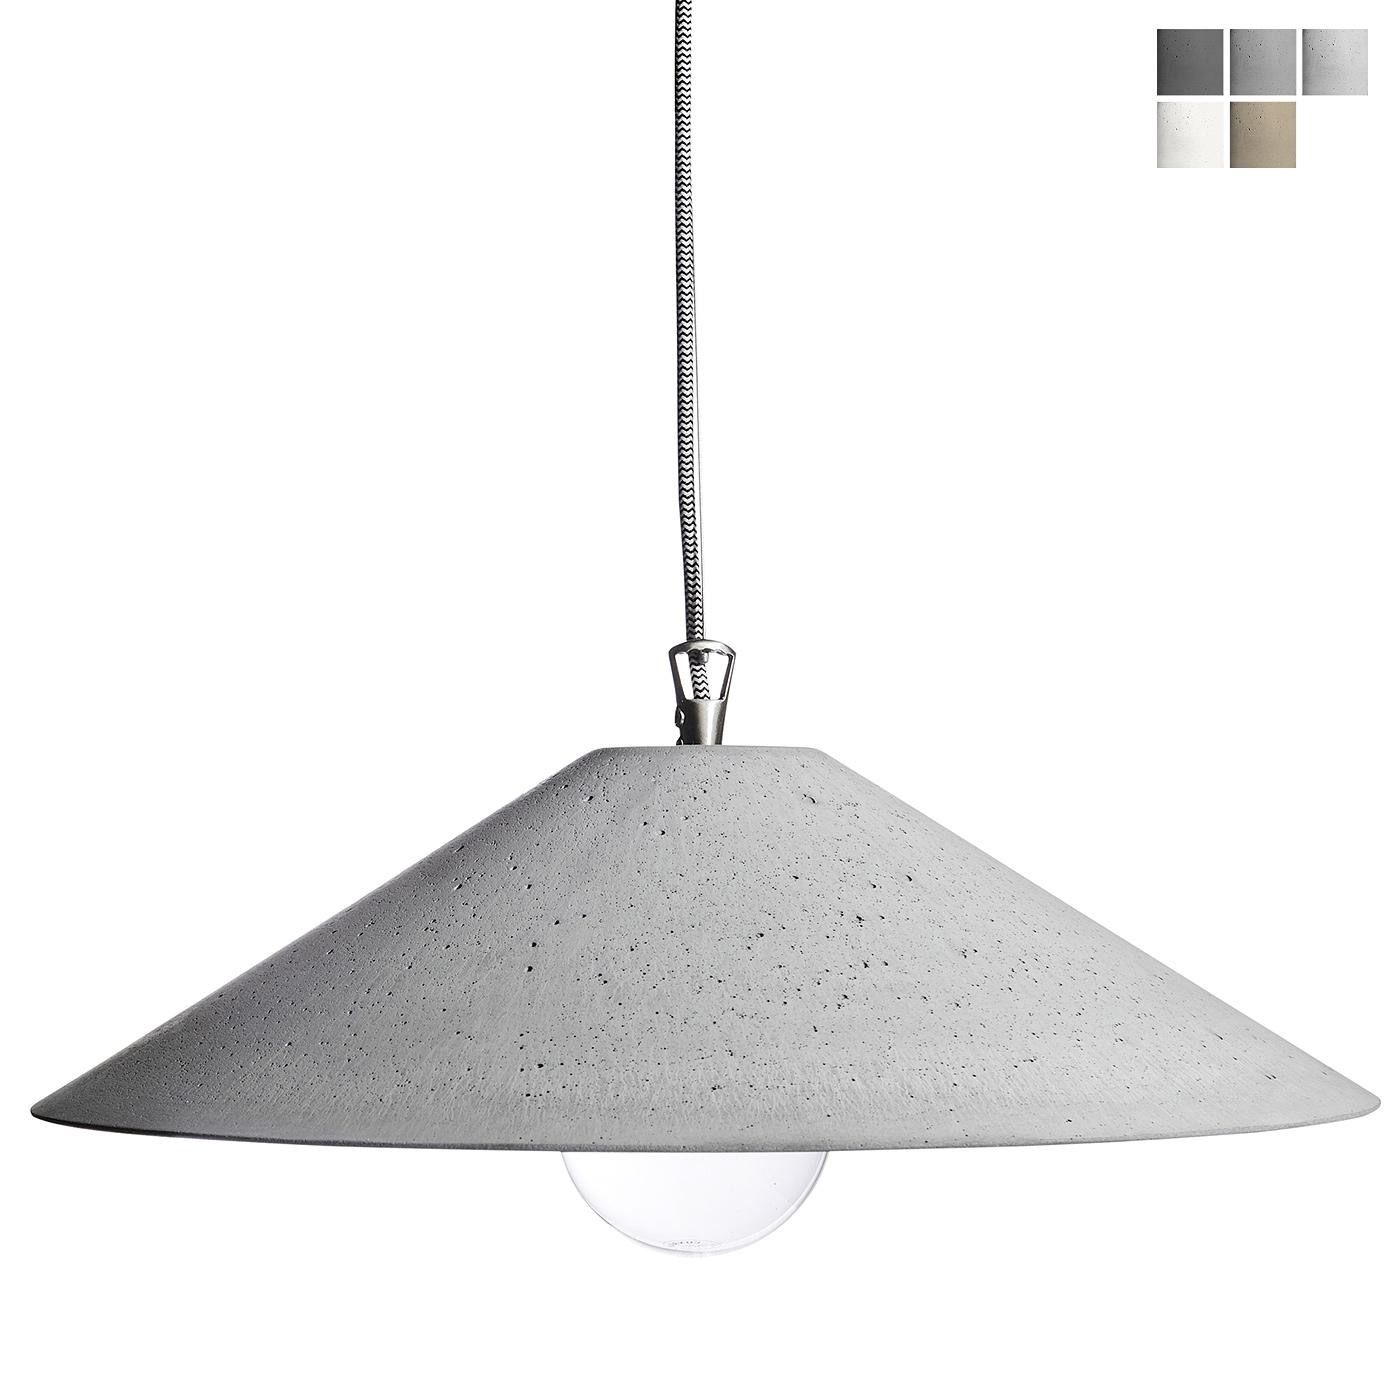 Flache lampen free deckenlampe flach with flache lampen for Flache deckenlampe